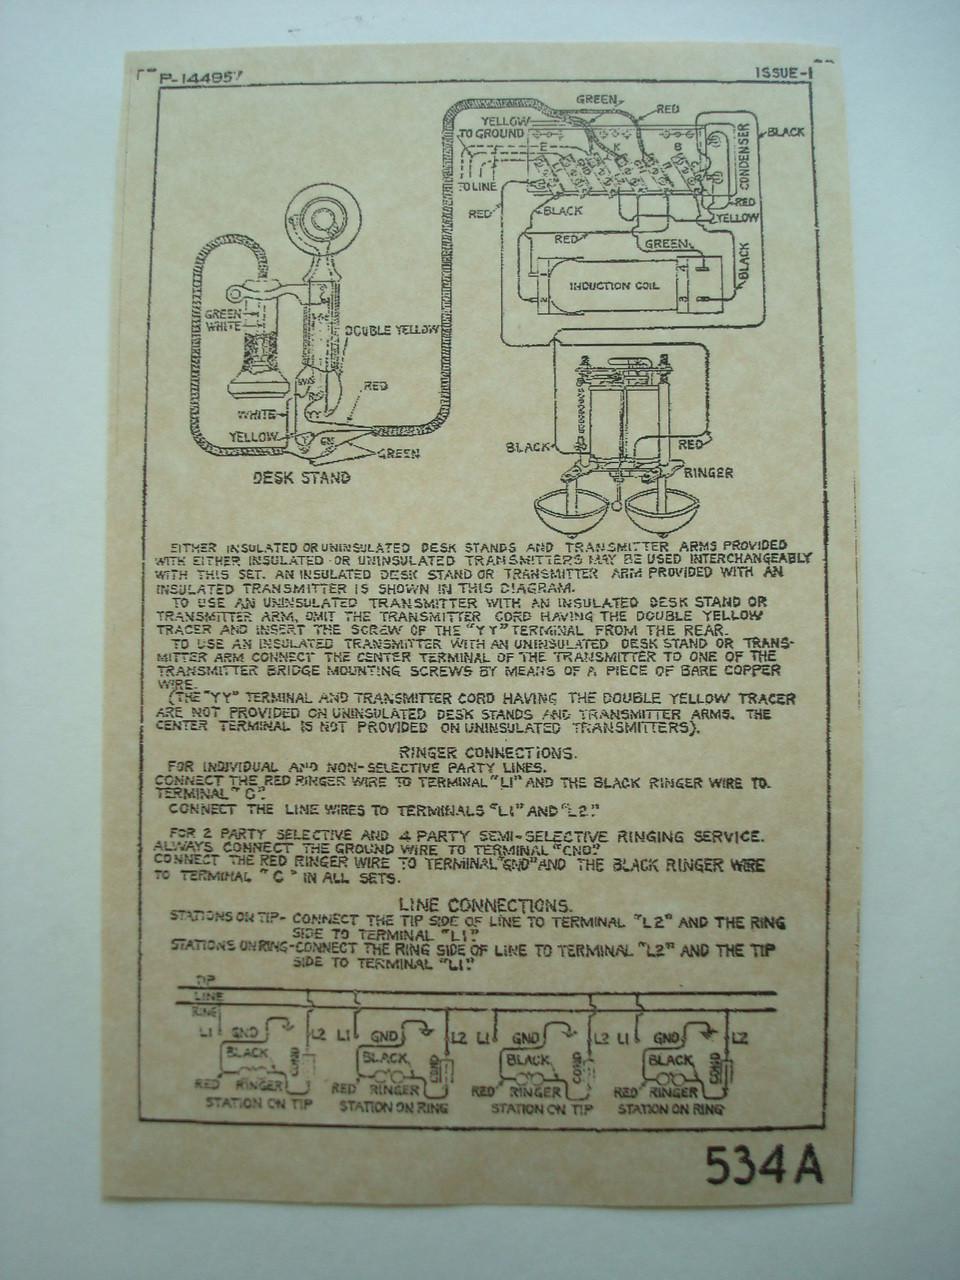 Candlestick Wiring Diagram - Schematic Wiring Diagram on